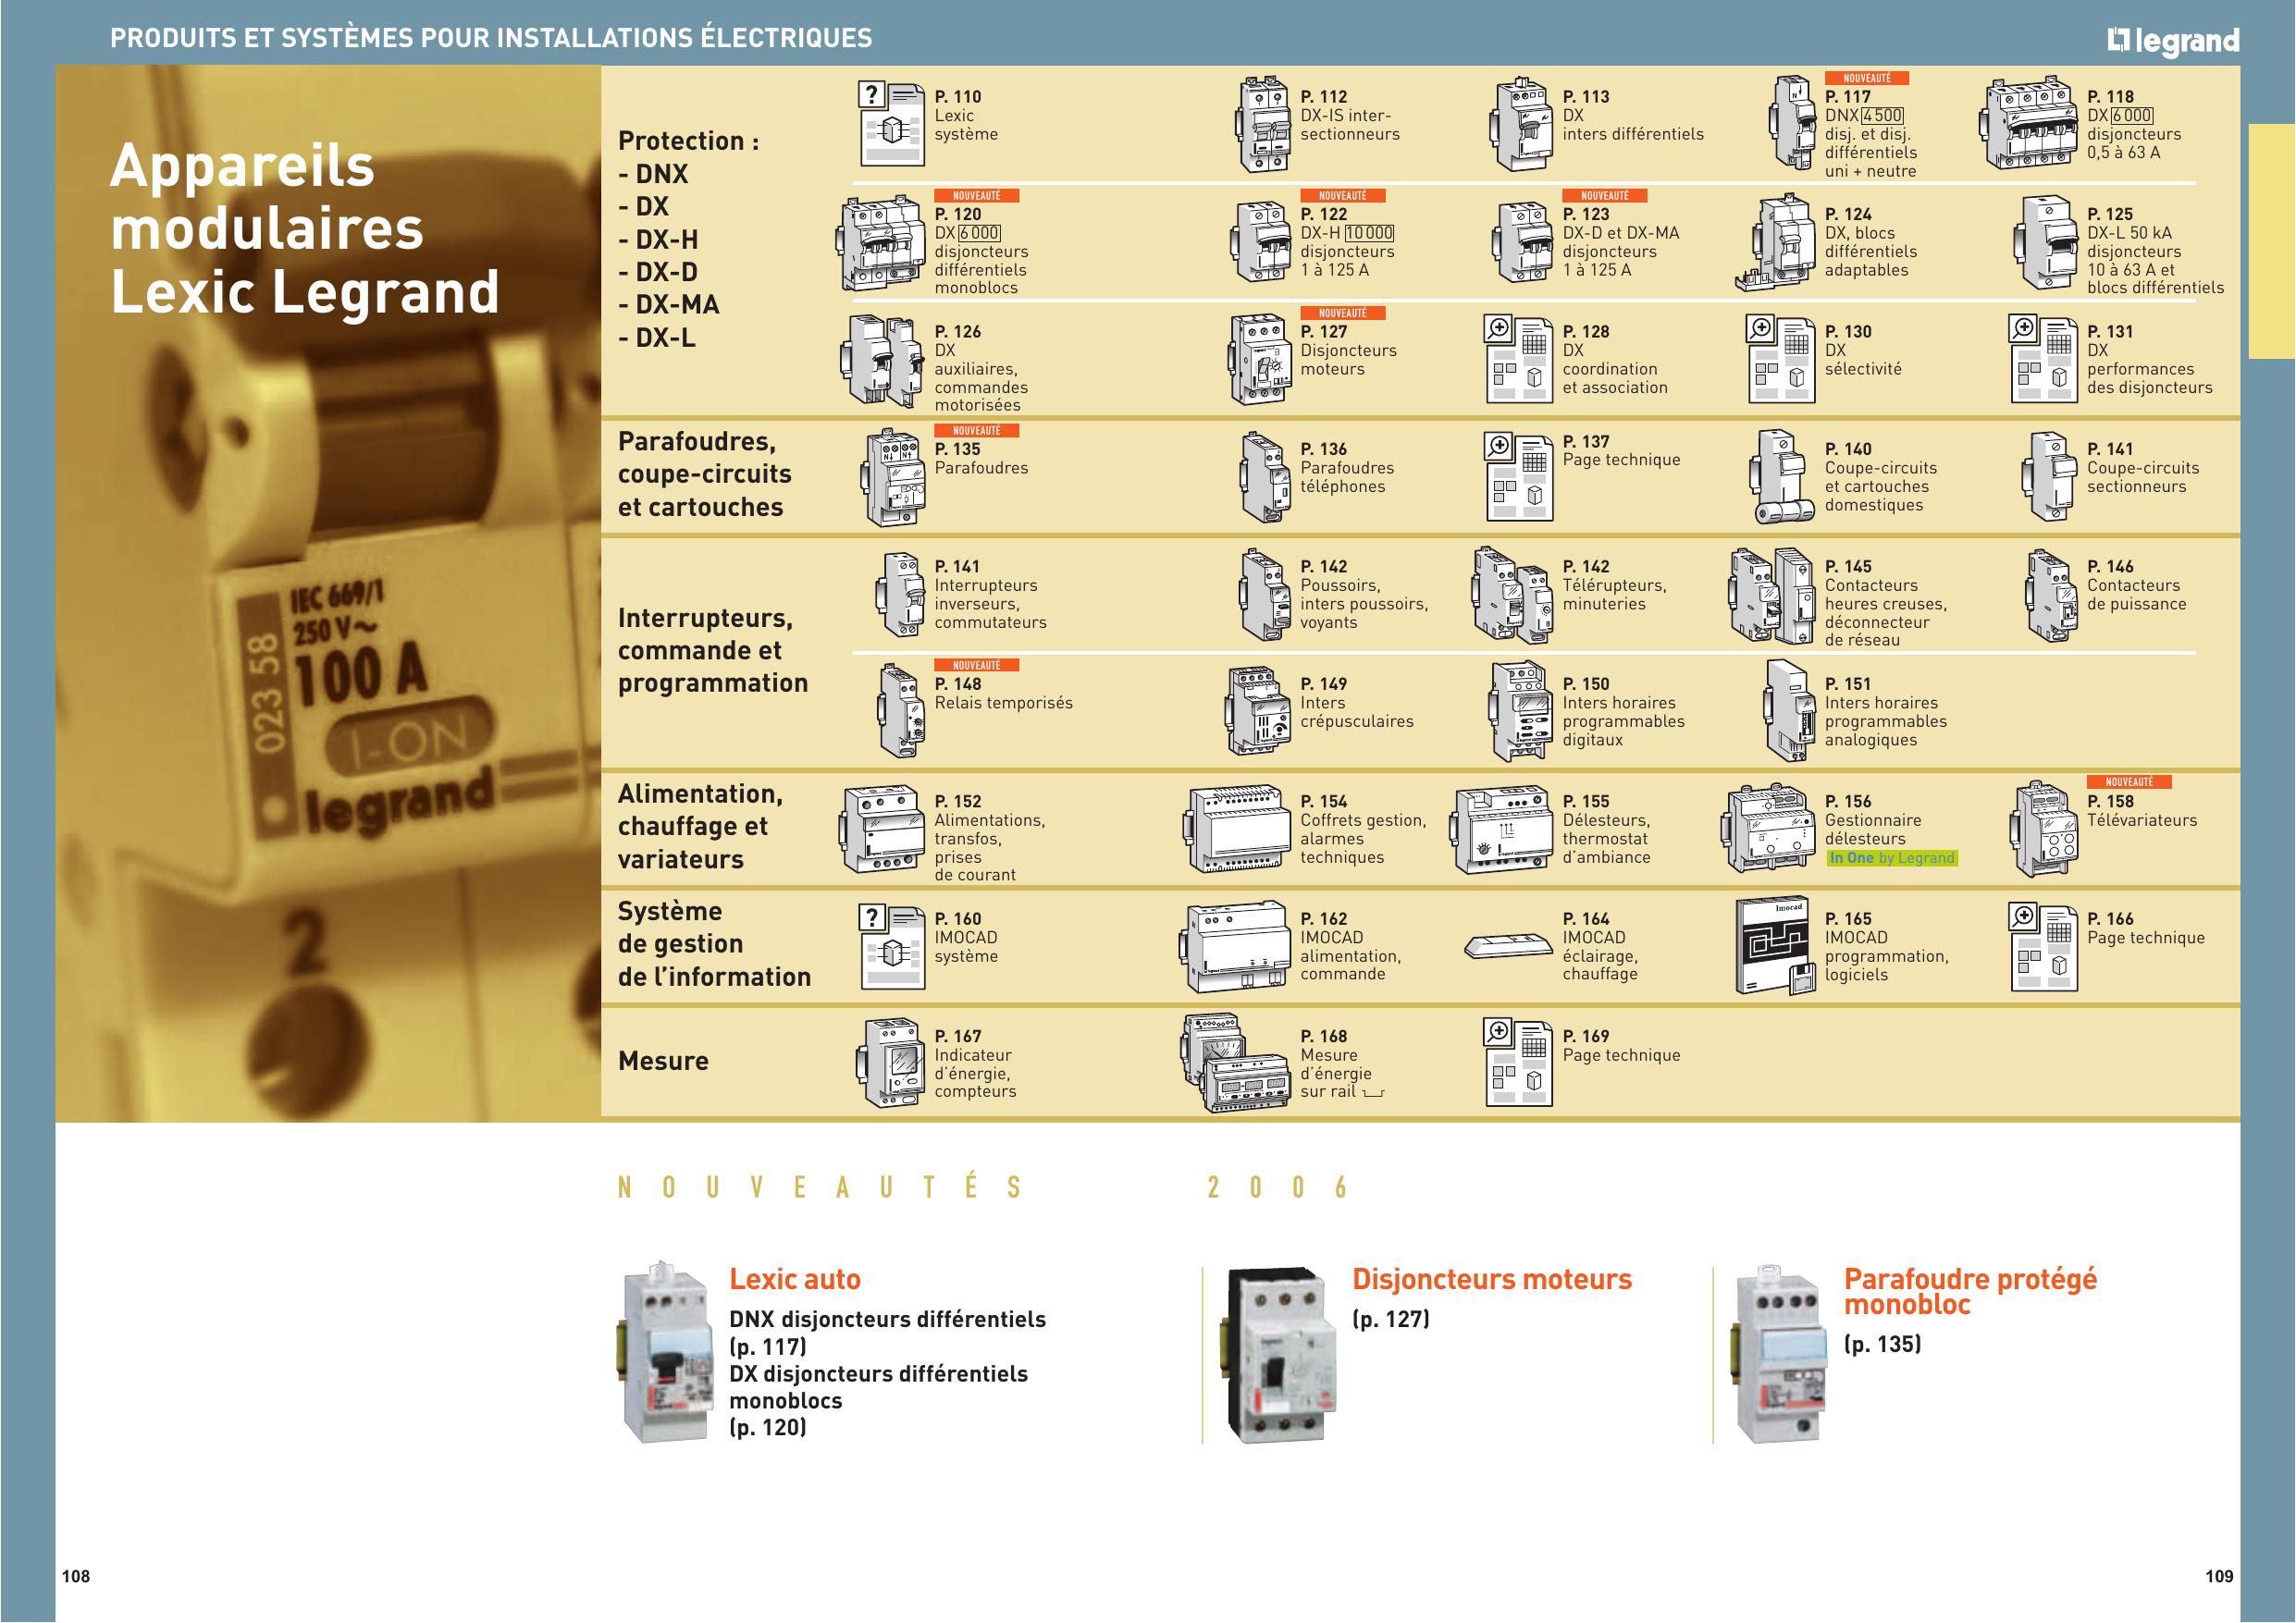 Appareils Modulaires Lexic Legrand Lexic Auto